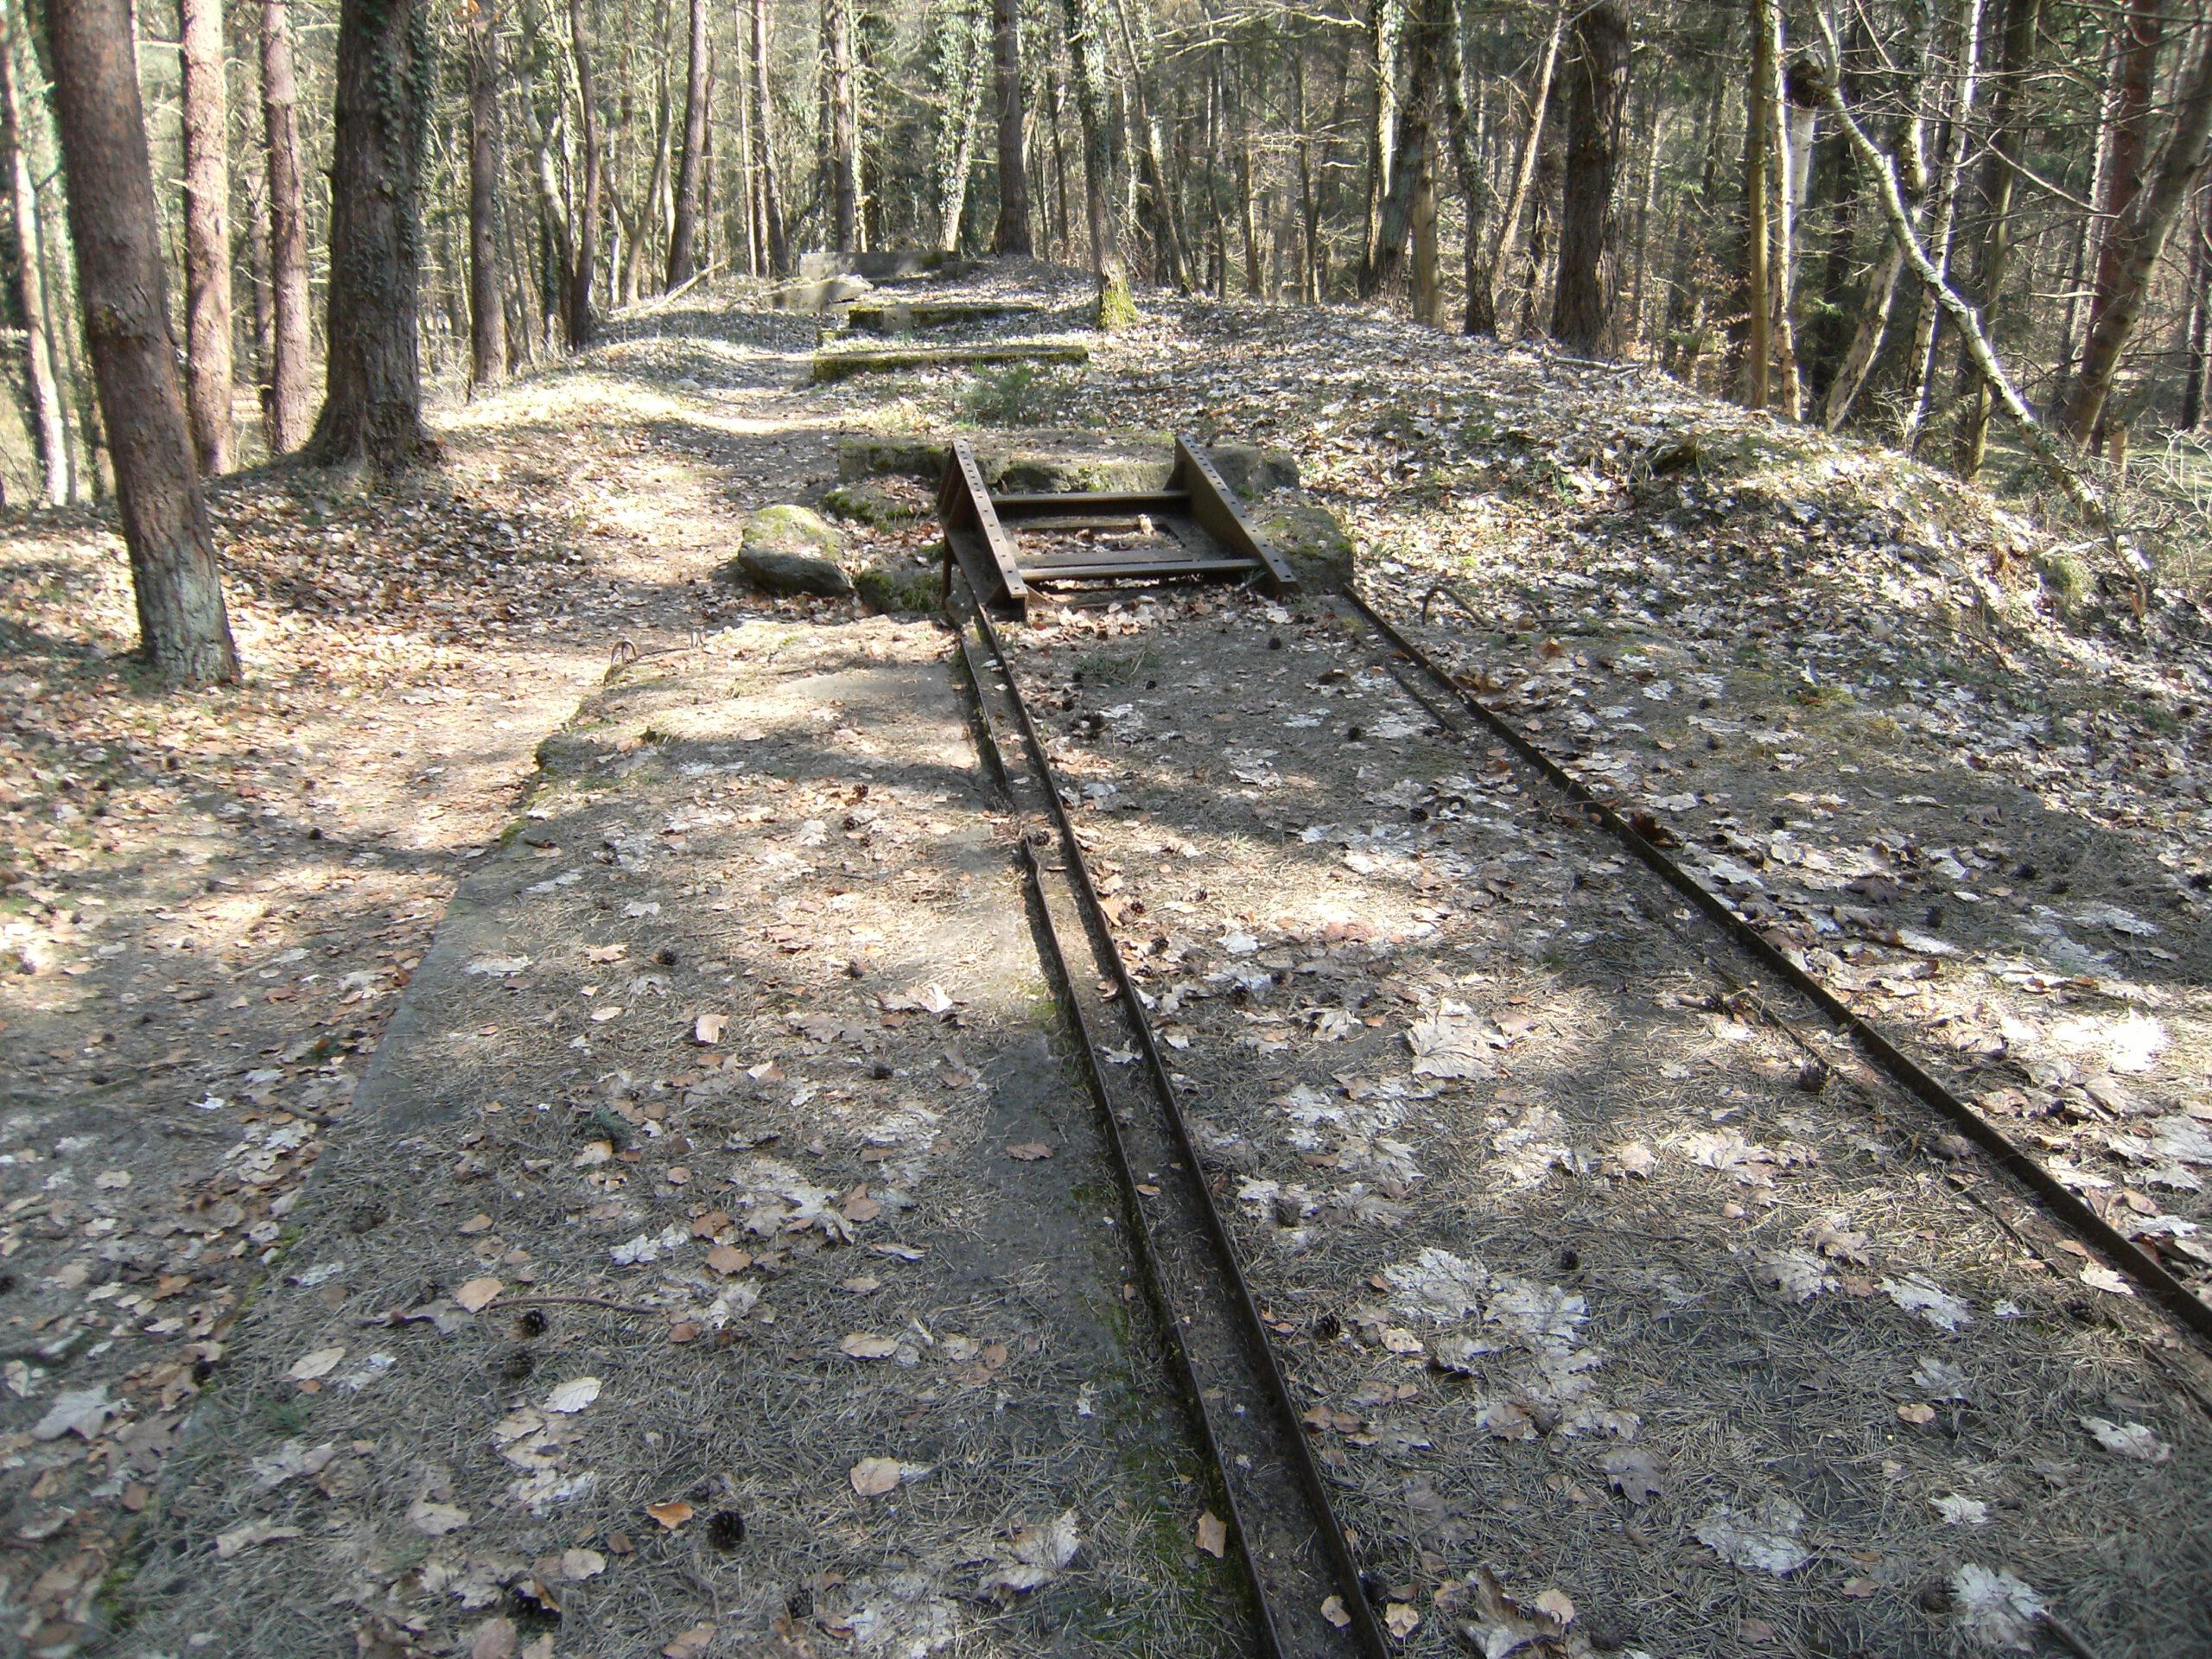 Zempin Reste V1-Rampe Insel Usedom Ausflugsziel Erholung Urlaub